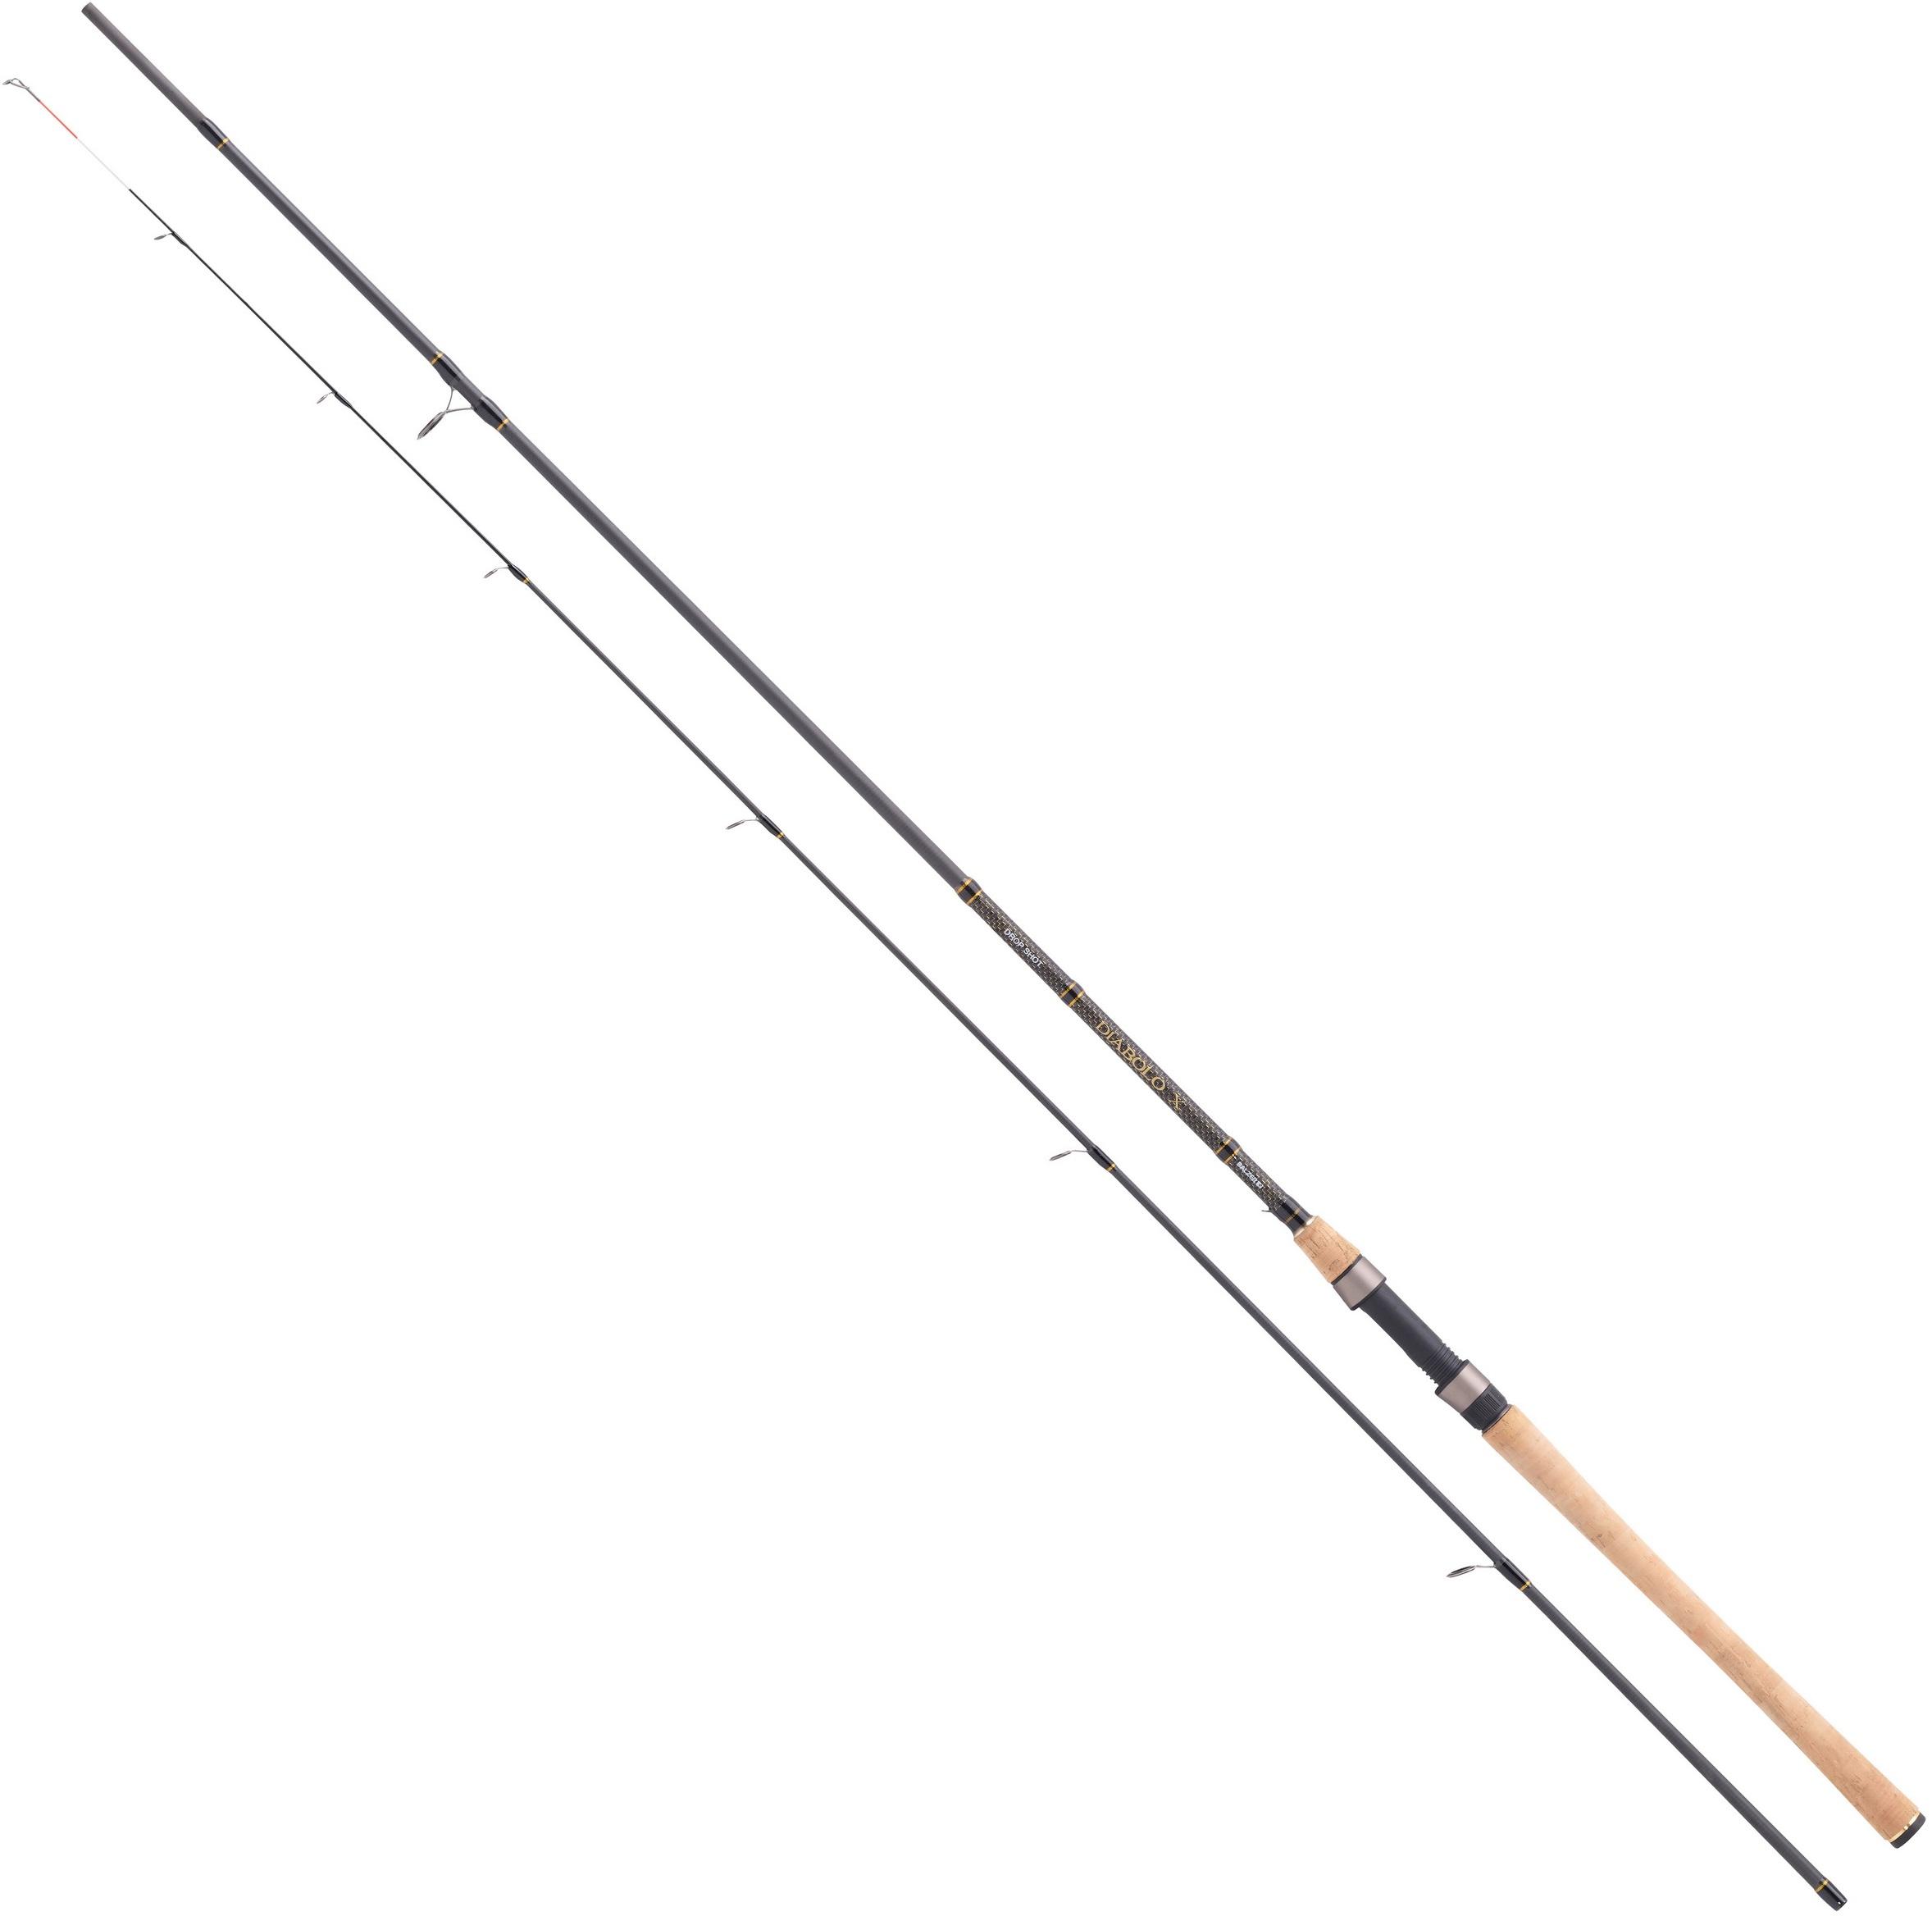 Спиннинг Balzer Diabolo X IM7 Drop Shot 2.30м 3-24гр